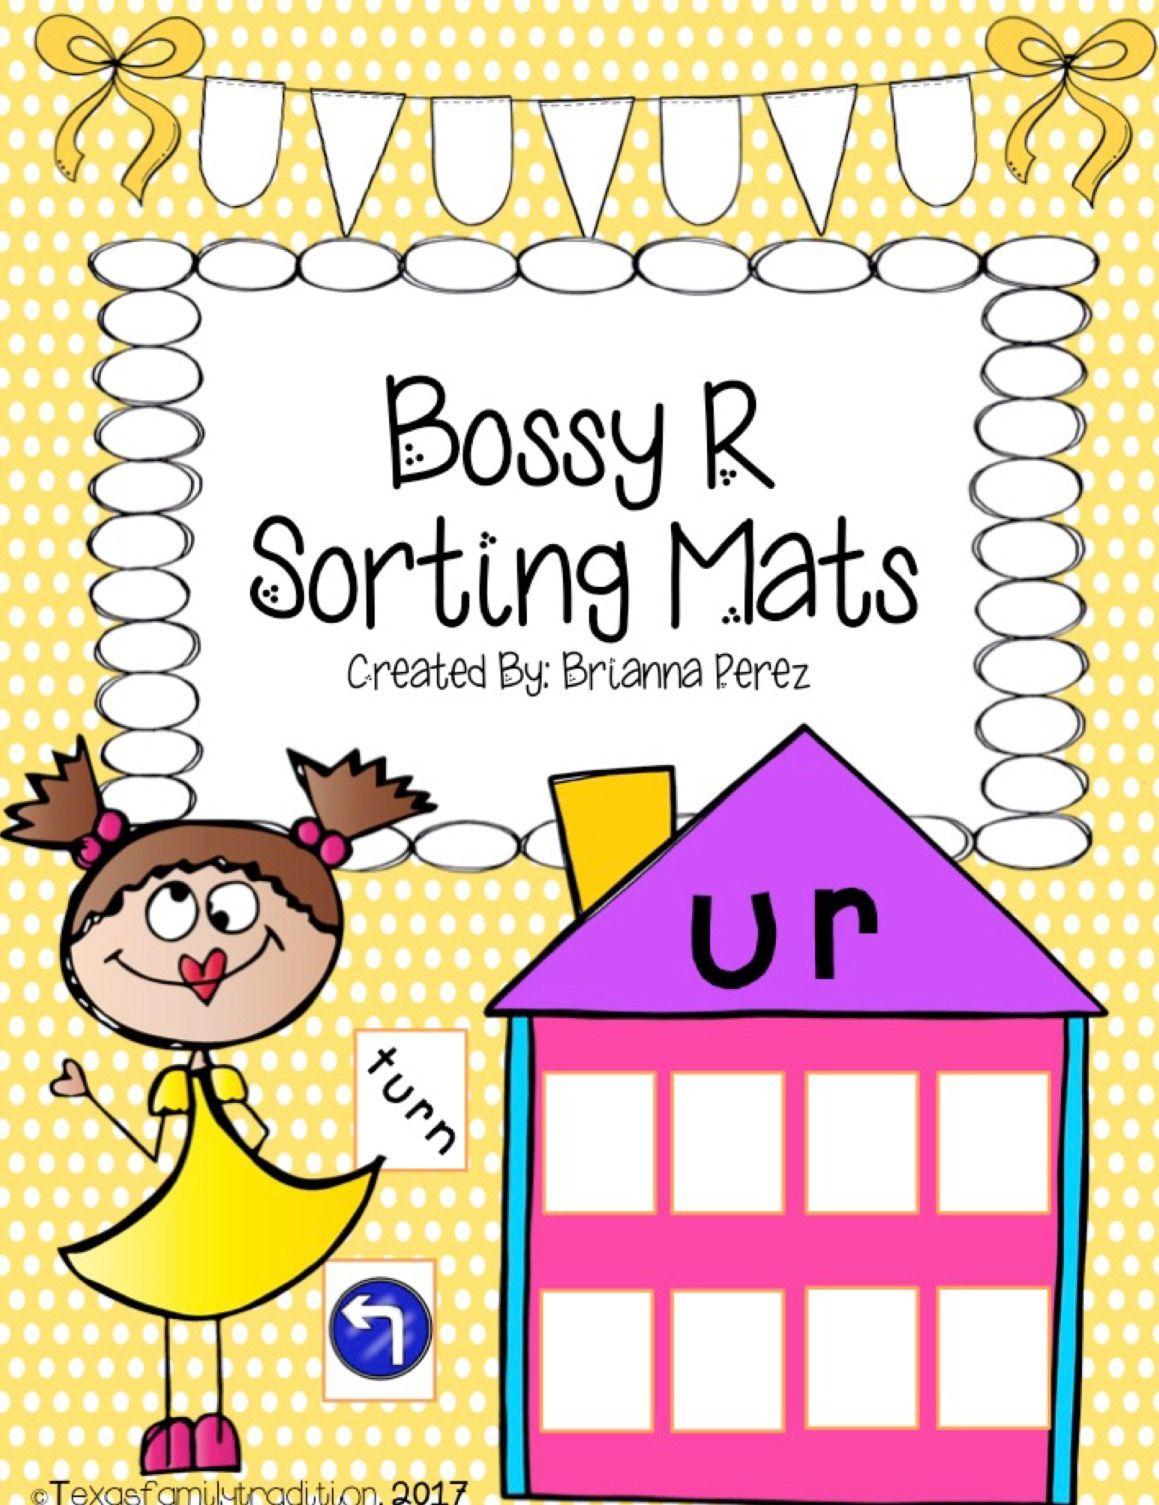 Bossy R Sorting Mats